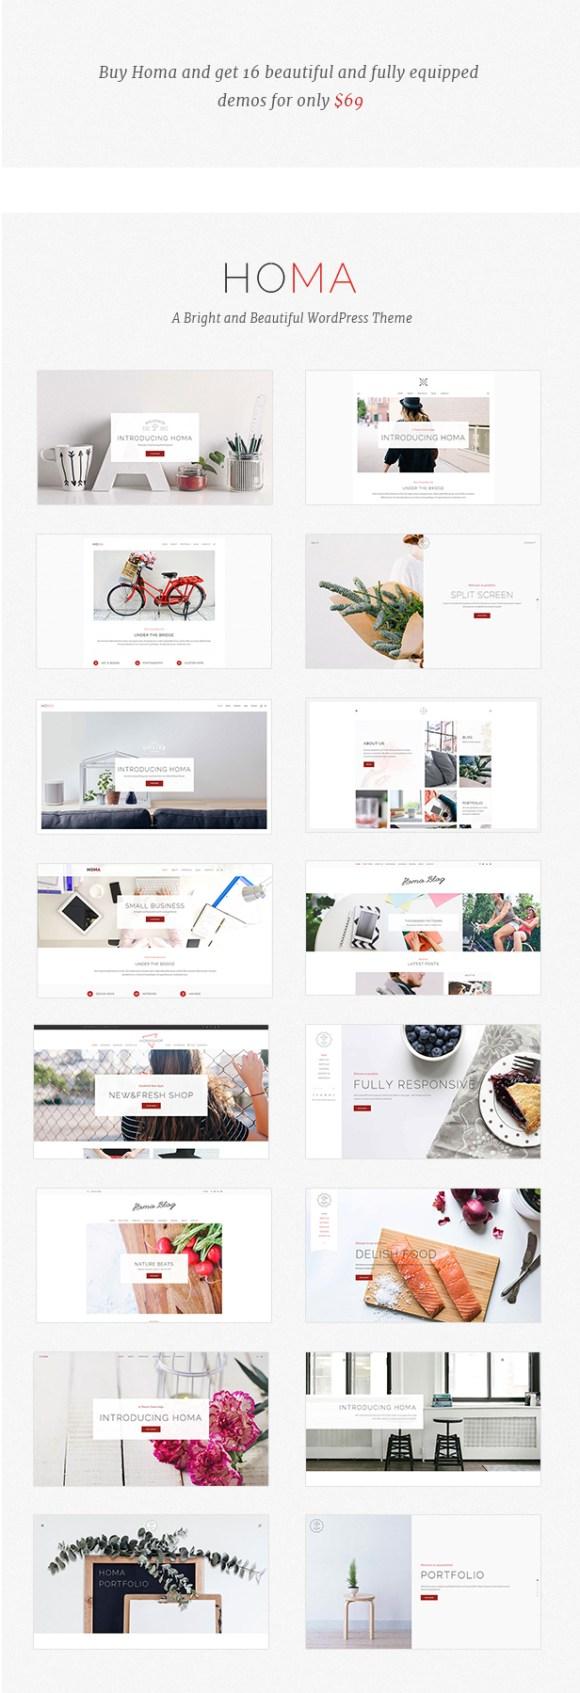 Homa - Elegant WordPress Theme - 1